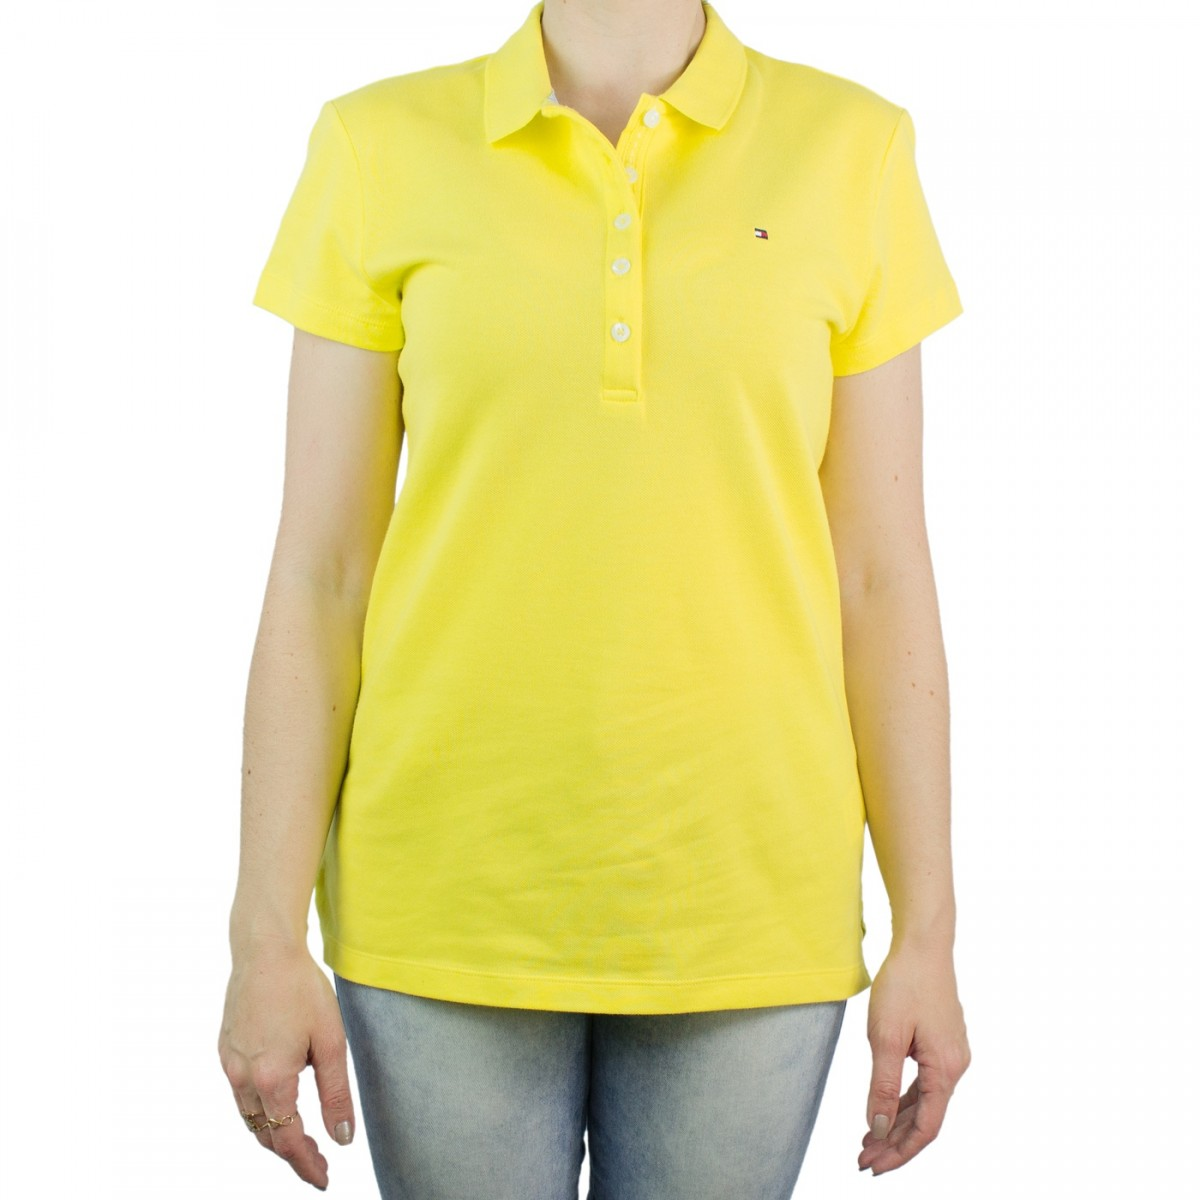 5d6f612878 Bizz Store - Camisa Polo Feminina Tommy Hilfiger Amarela Slim